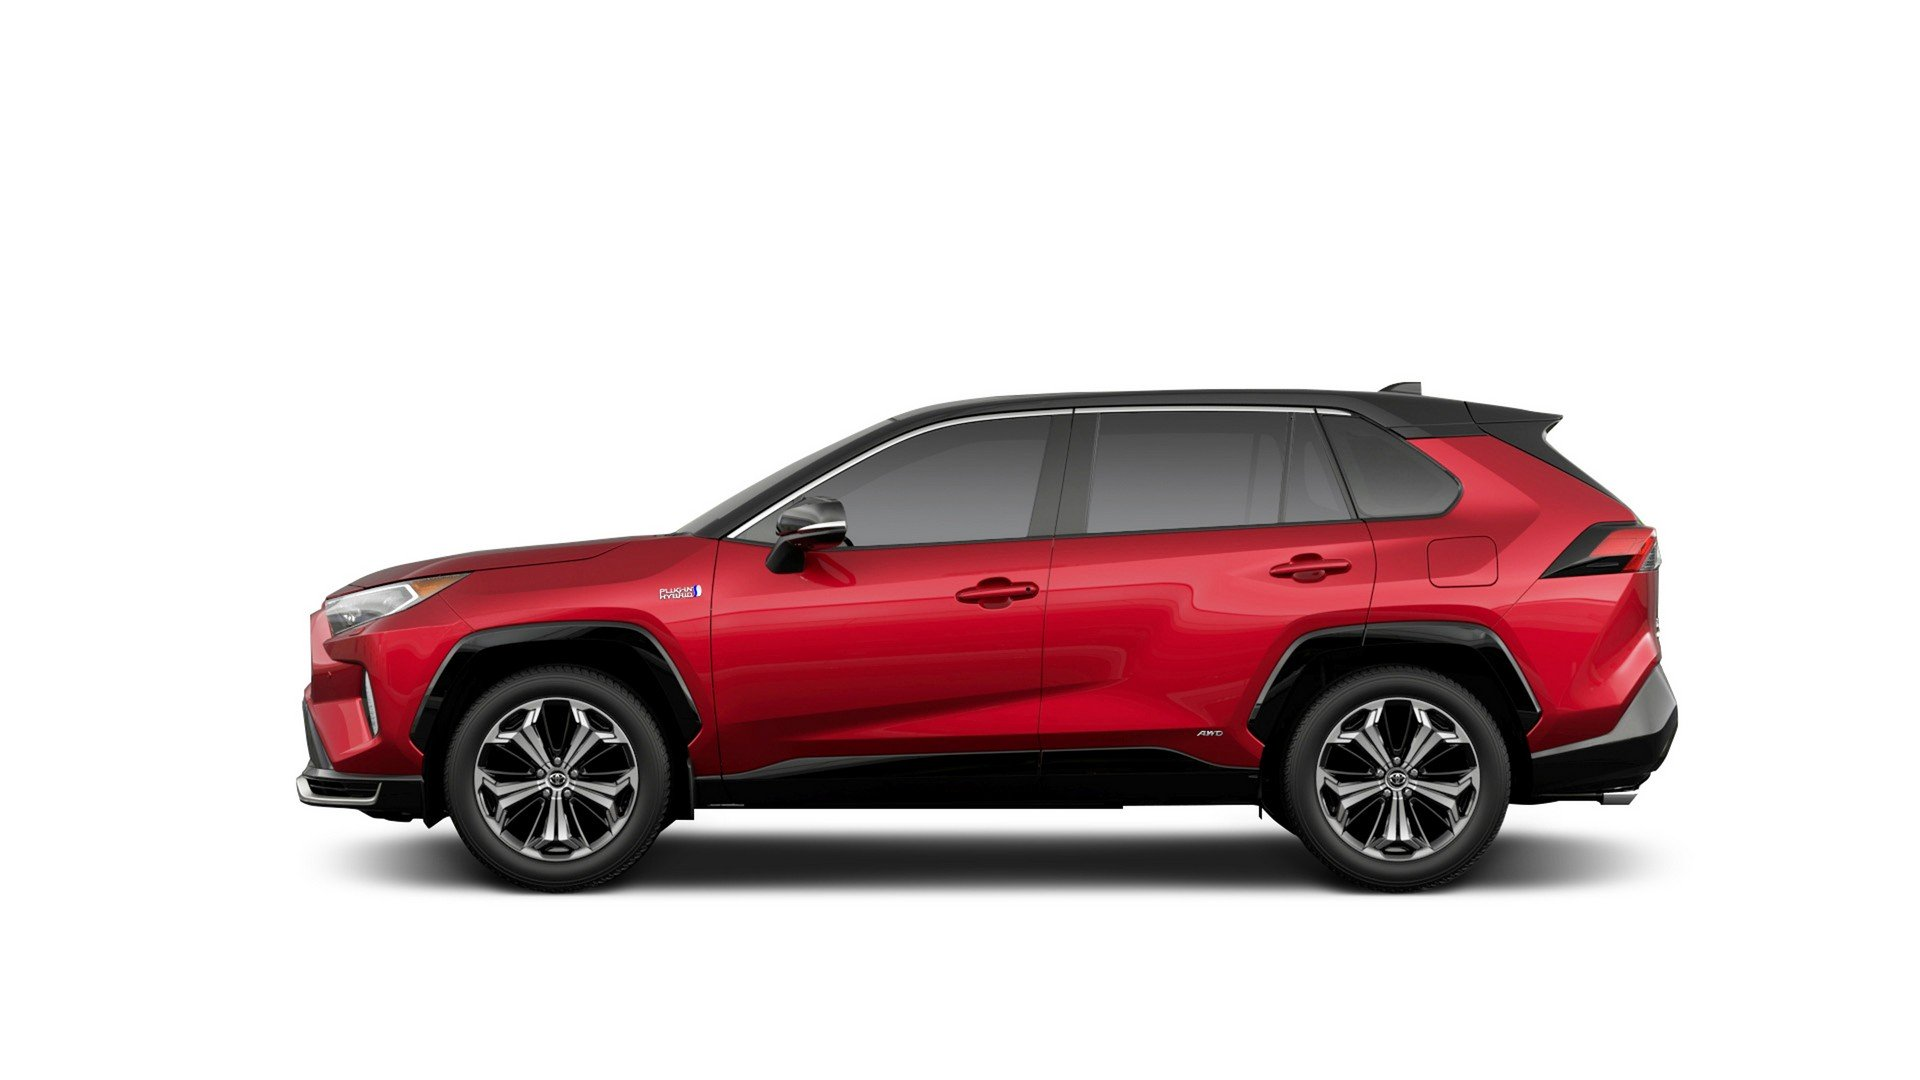 Toyota-RAV4-Plug-in-Hybrid-Prime-2020-10